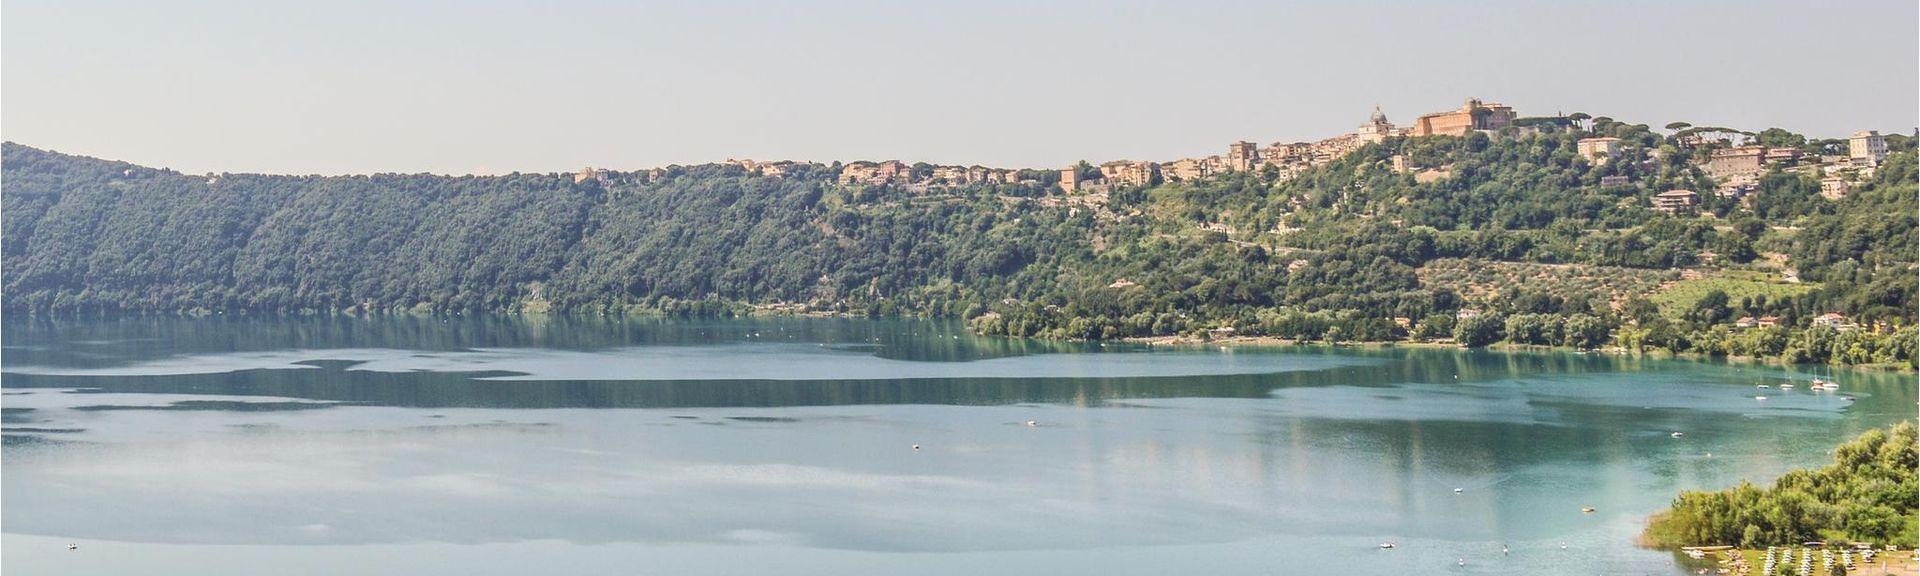 Lariano, Metropolitan City of Rome, Lazio, Italy